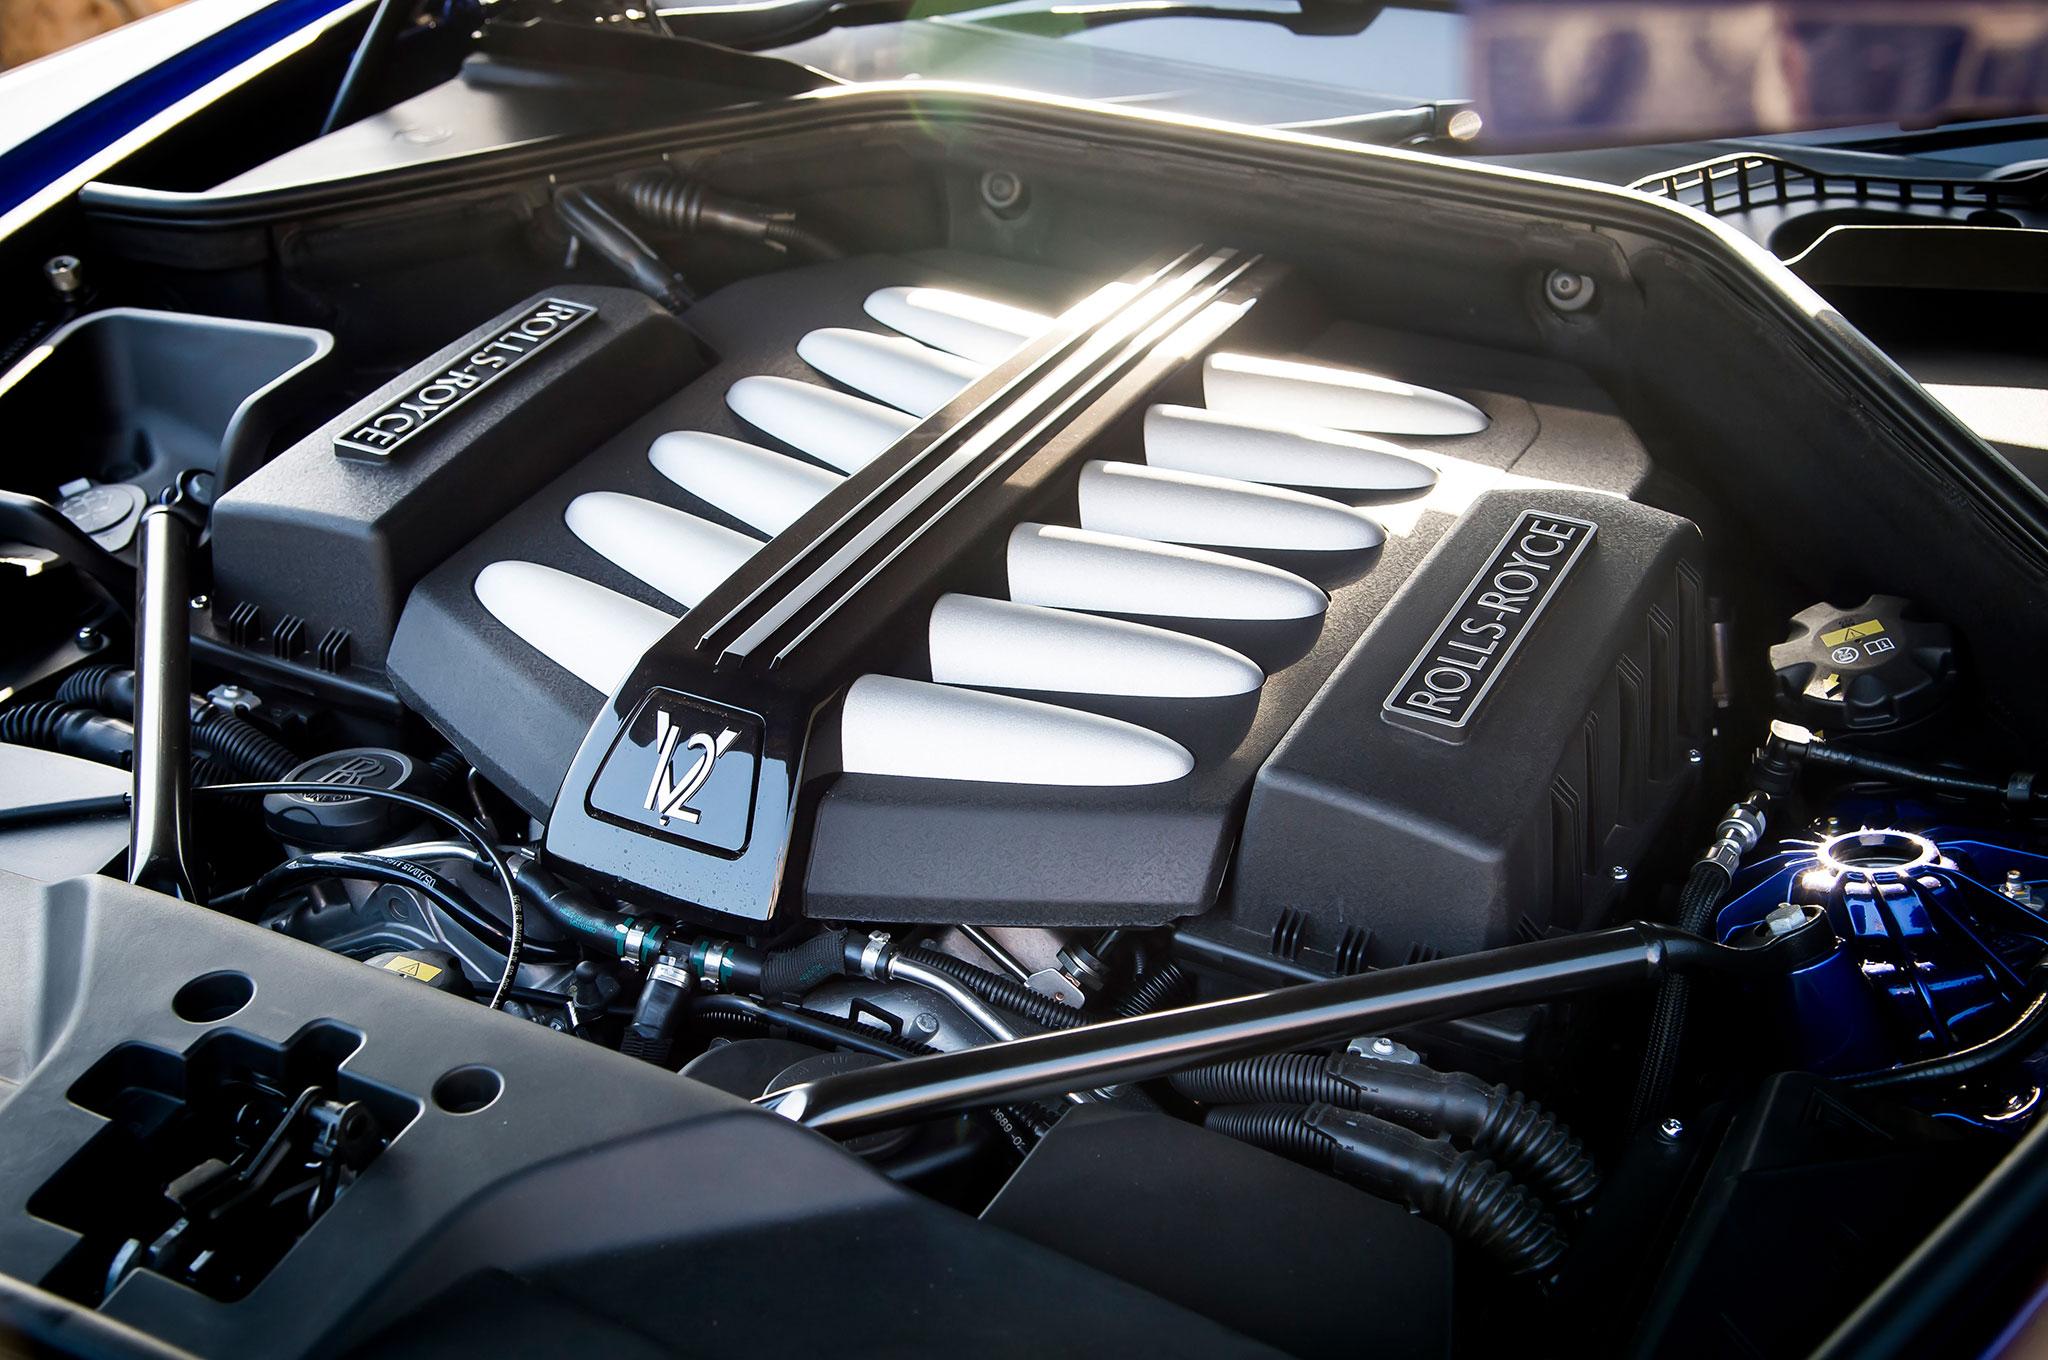 2016 rolls royce dawn first drive review for Rolls royce phantom motor